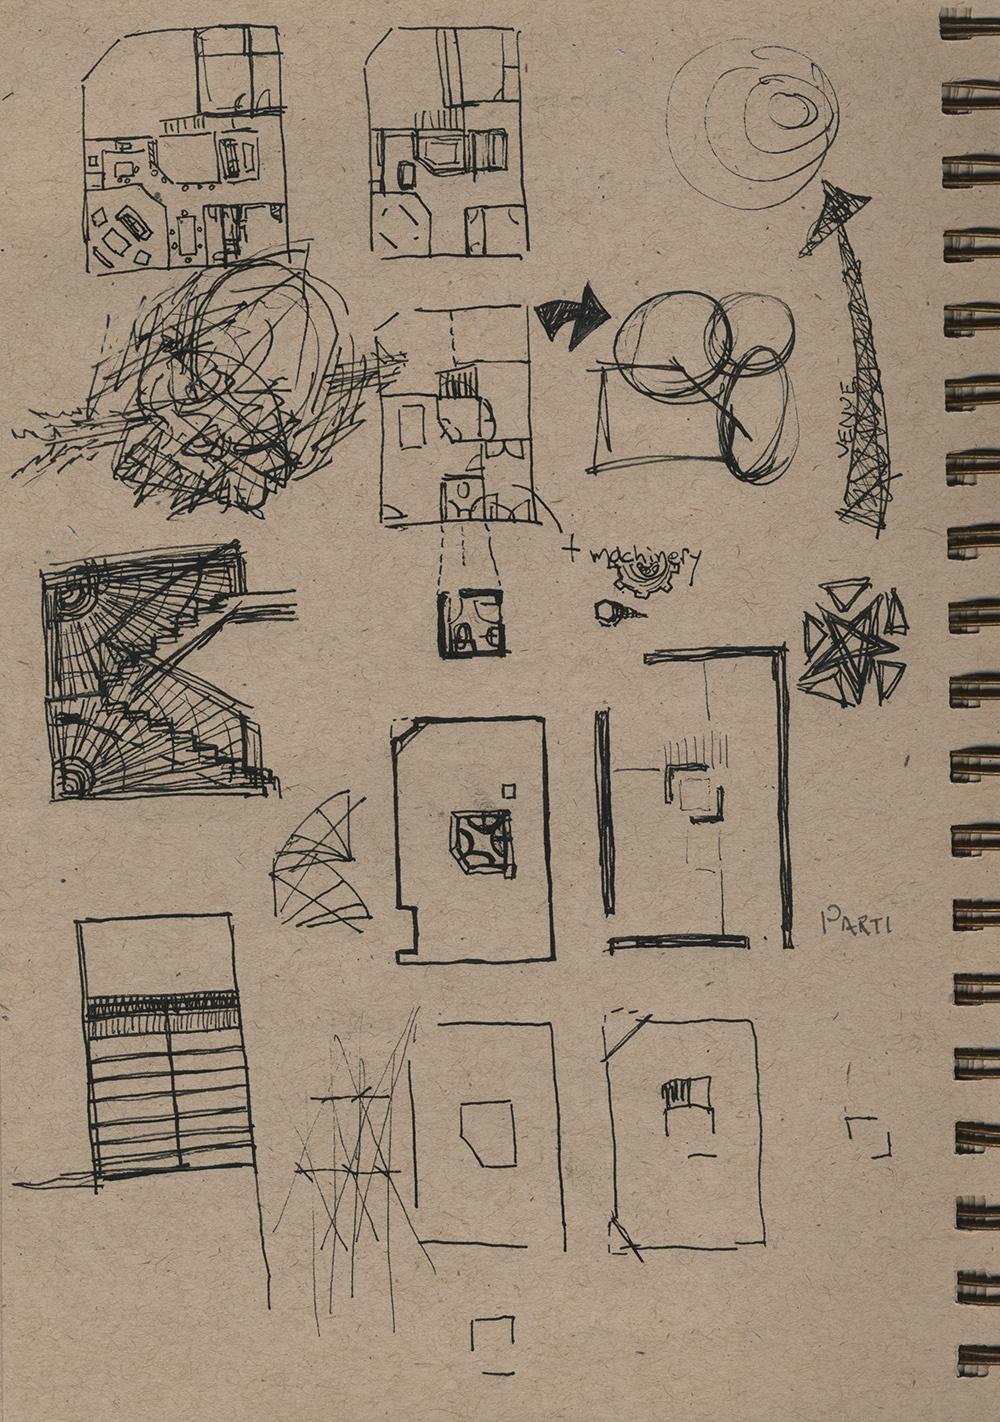 ST1_P3_Sketch03